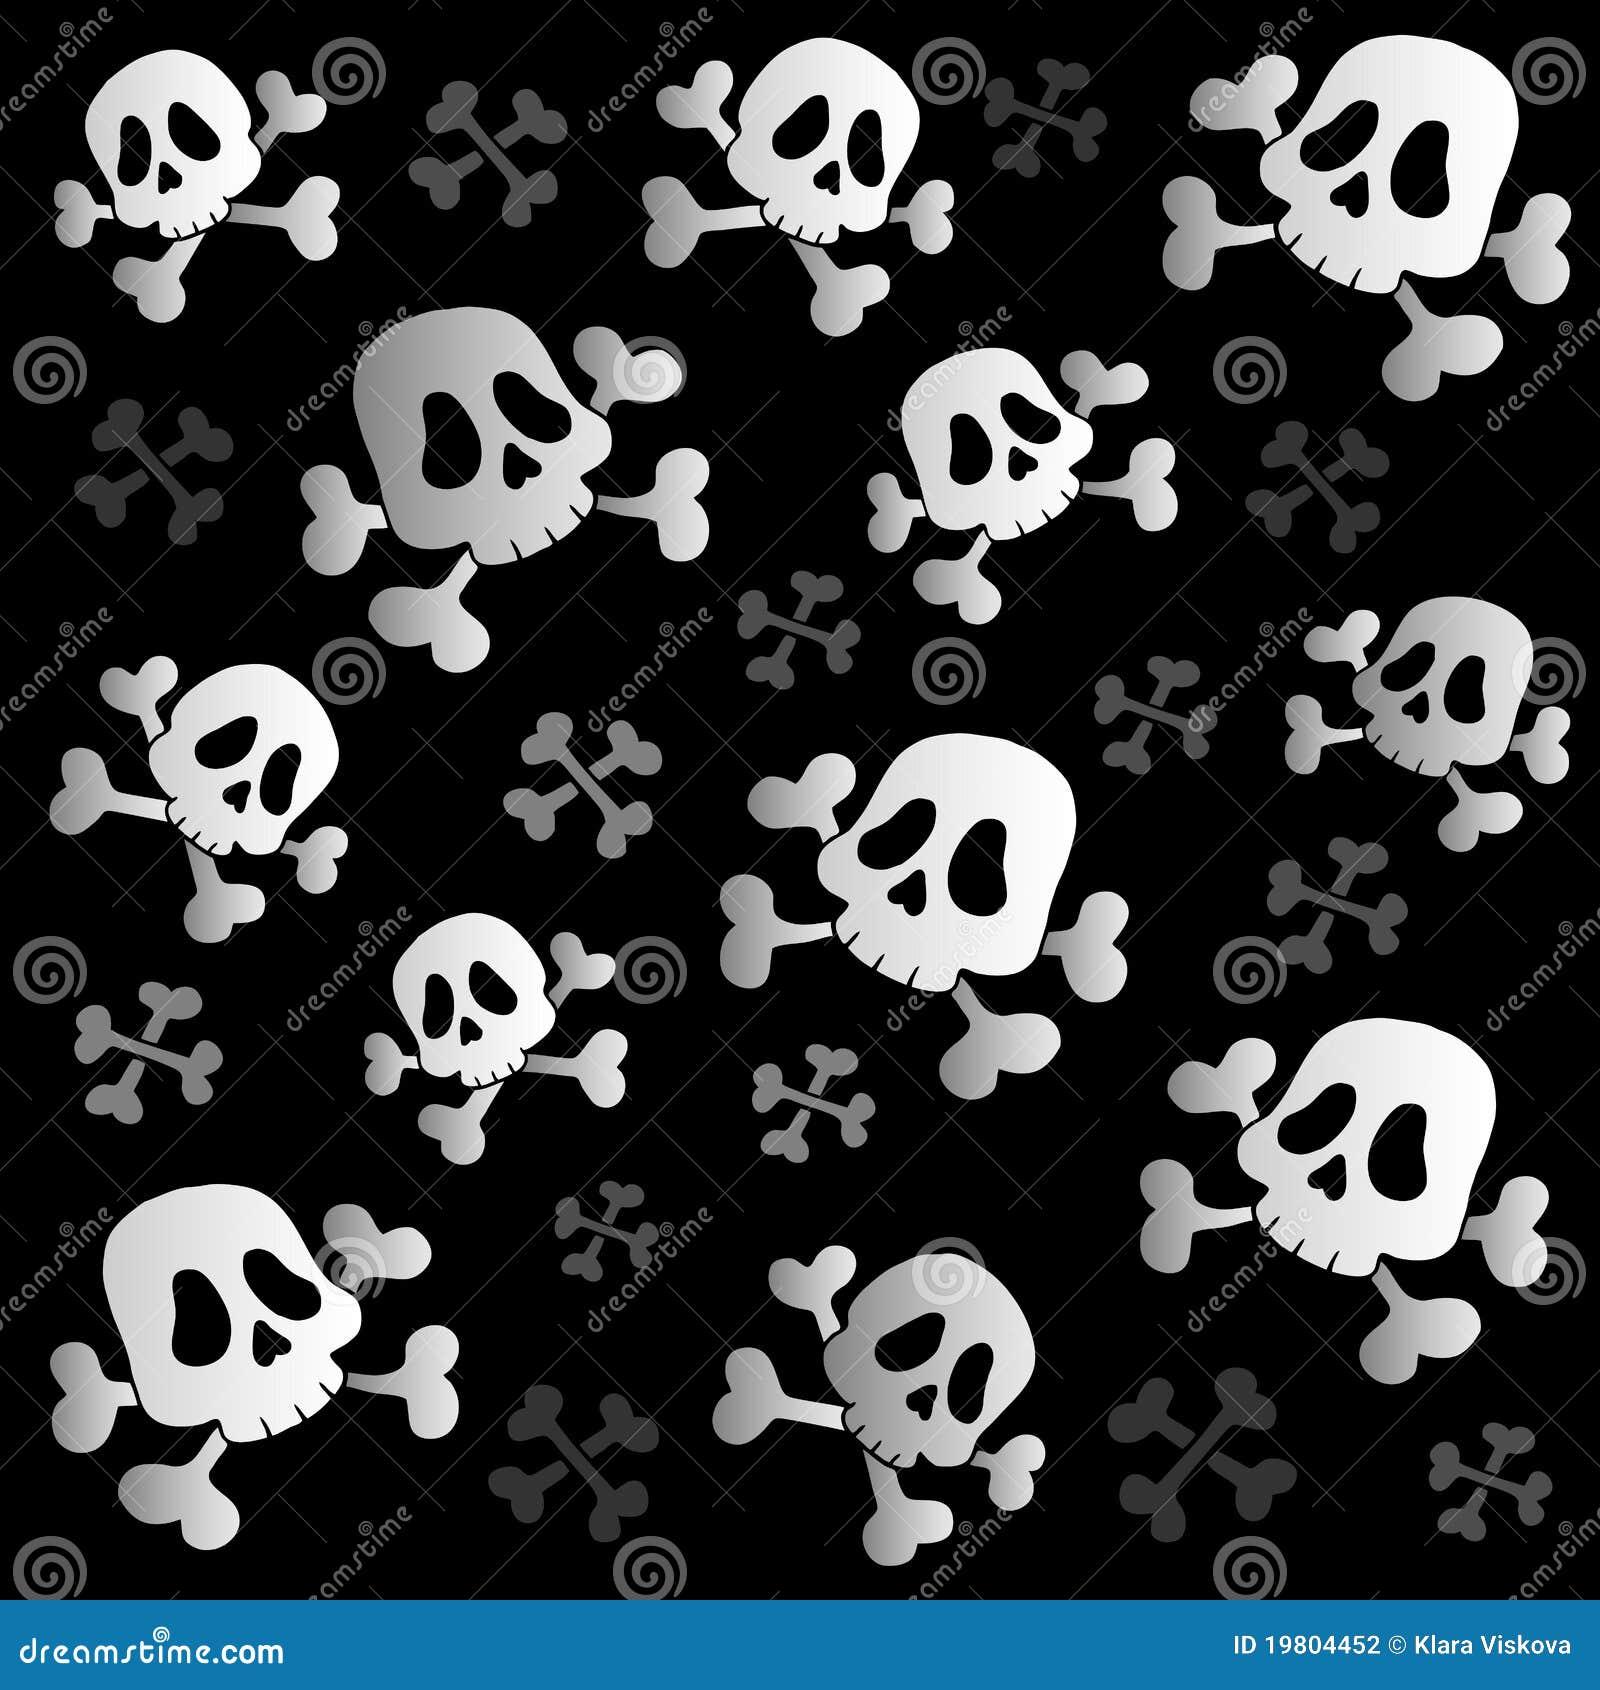 Pirate Skulls And Bones Stock Vector Illustration Of Poison 19804452